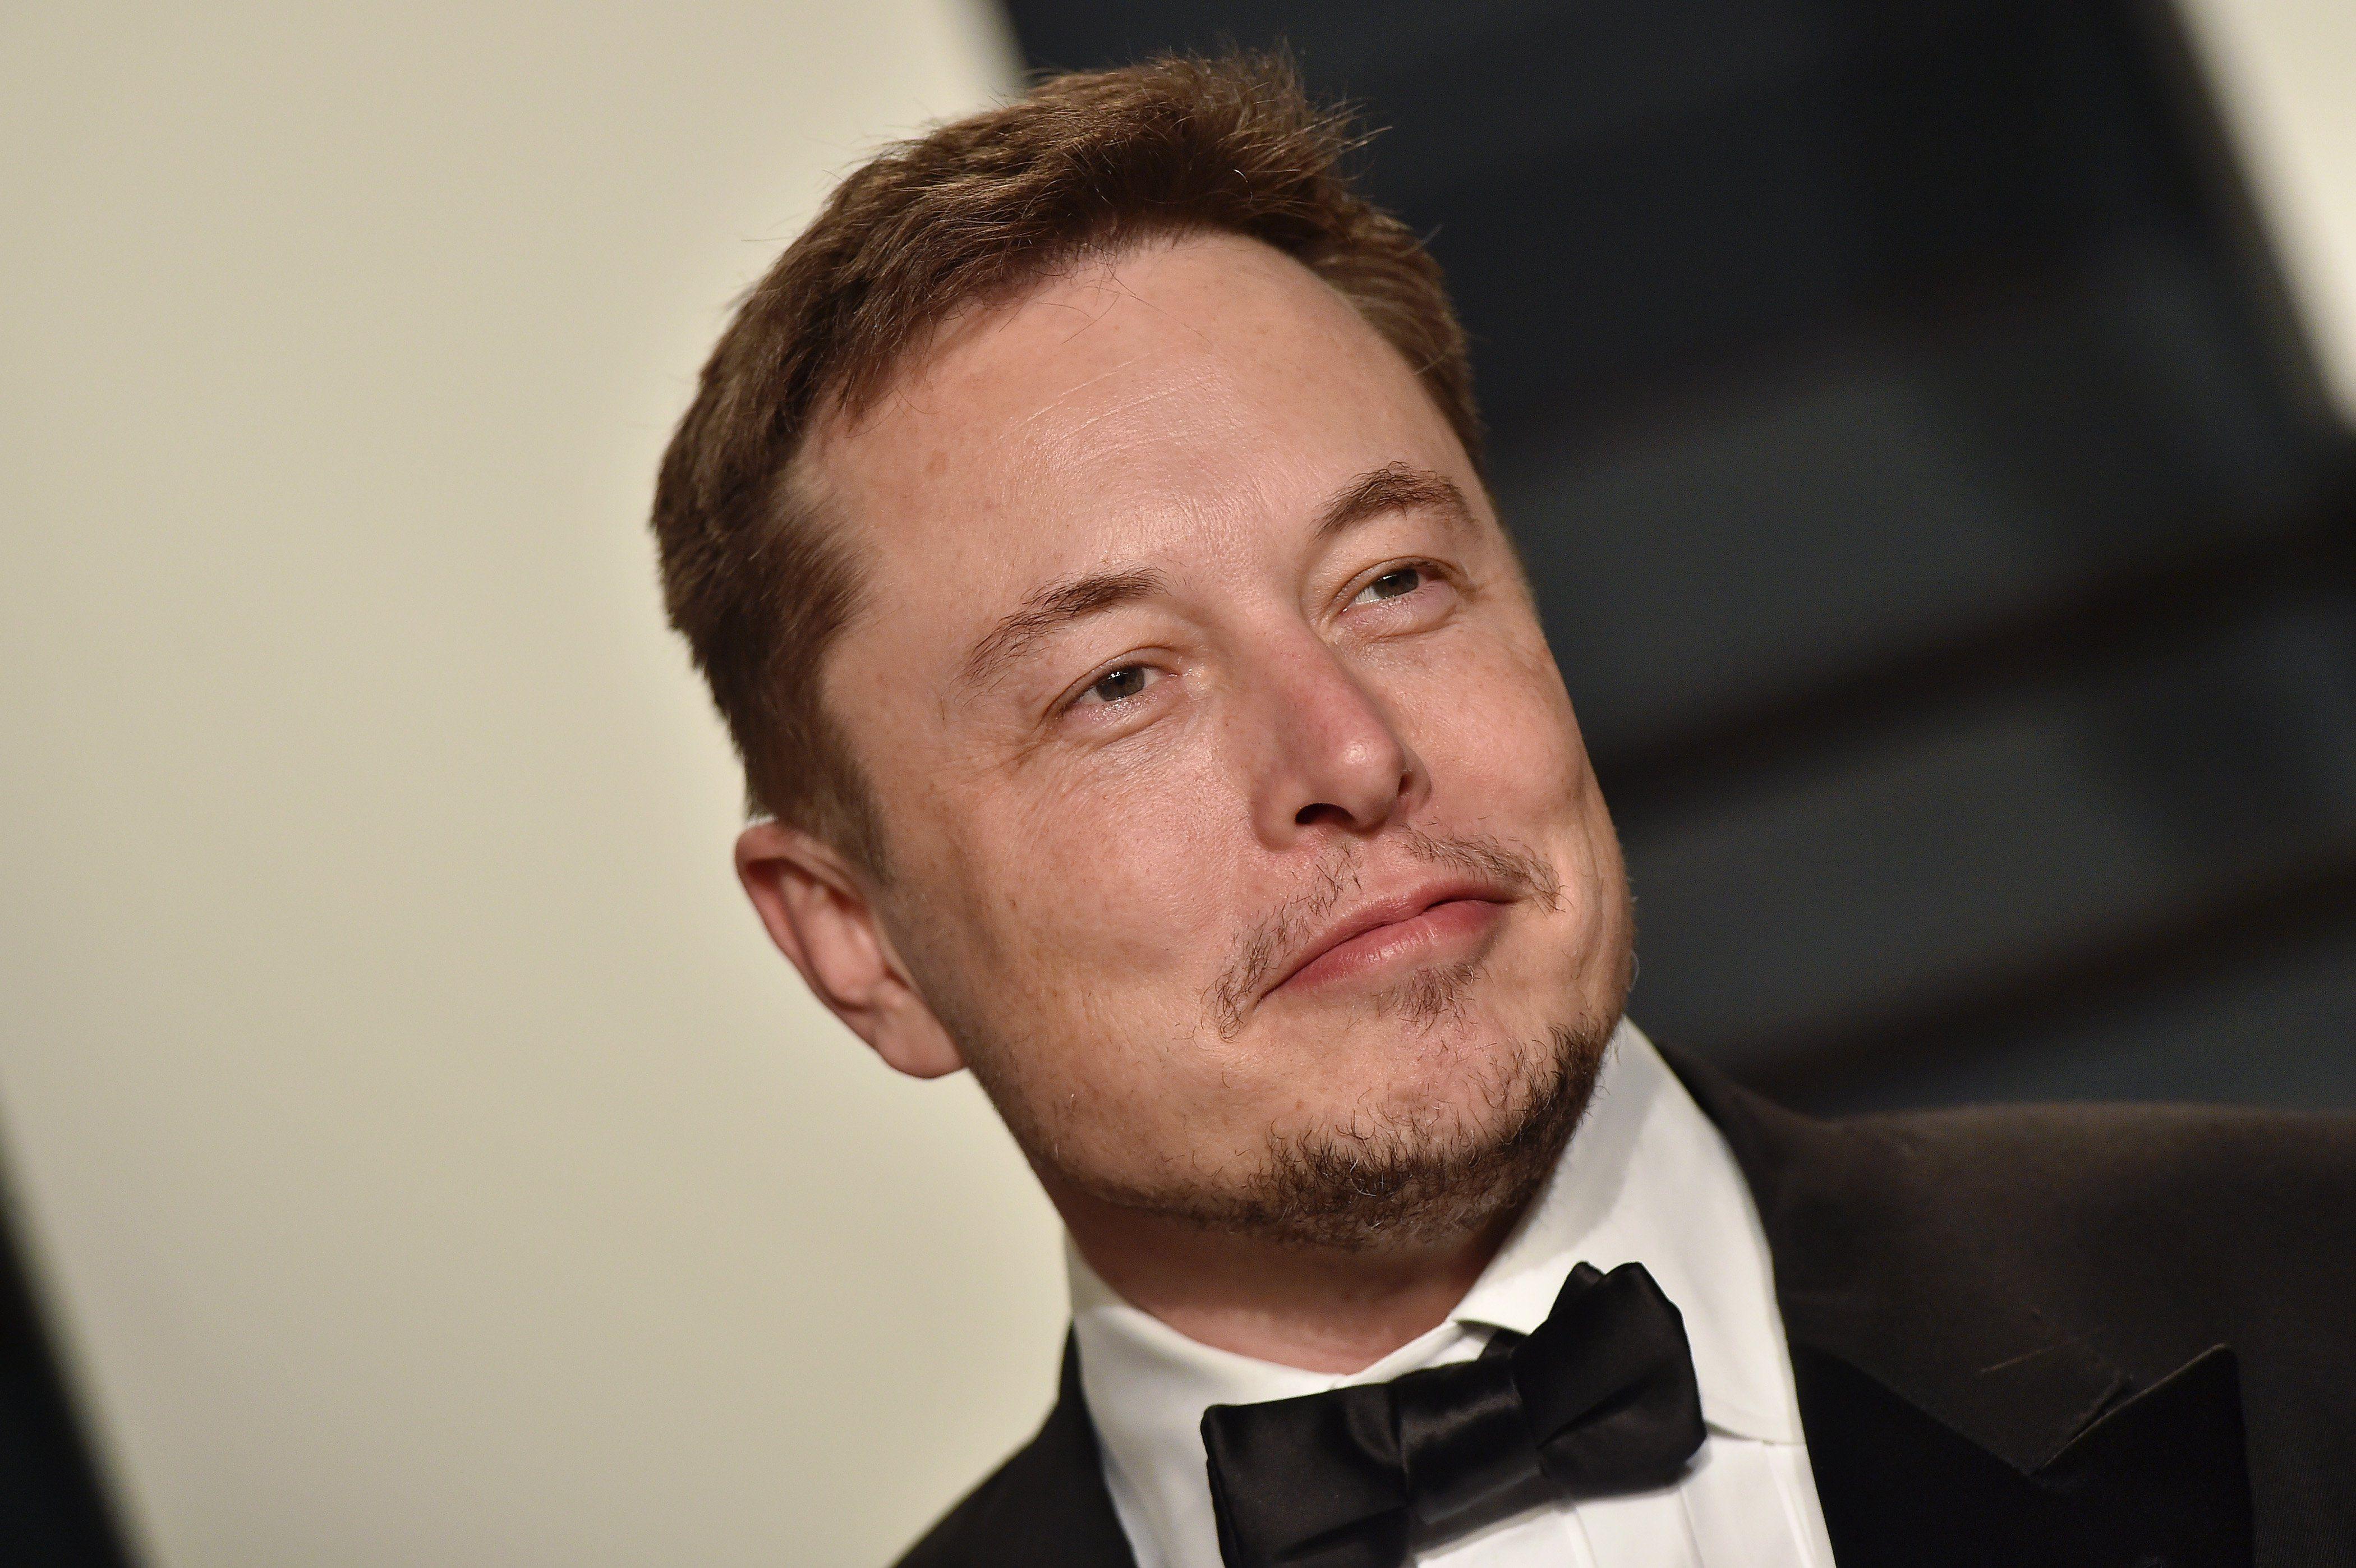 Nextadvisor With Time Elon Musk Elon Musk Tesla Elon Musk Hyperloop